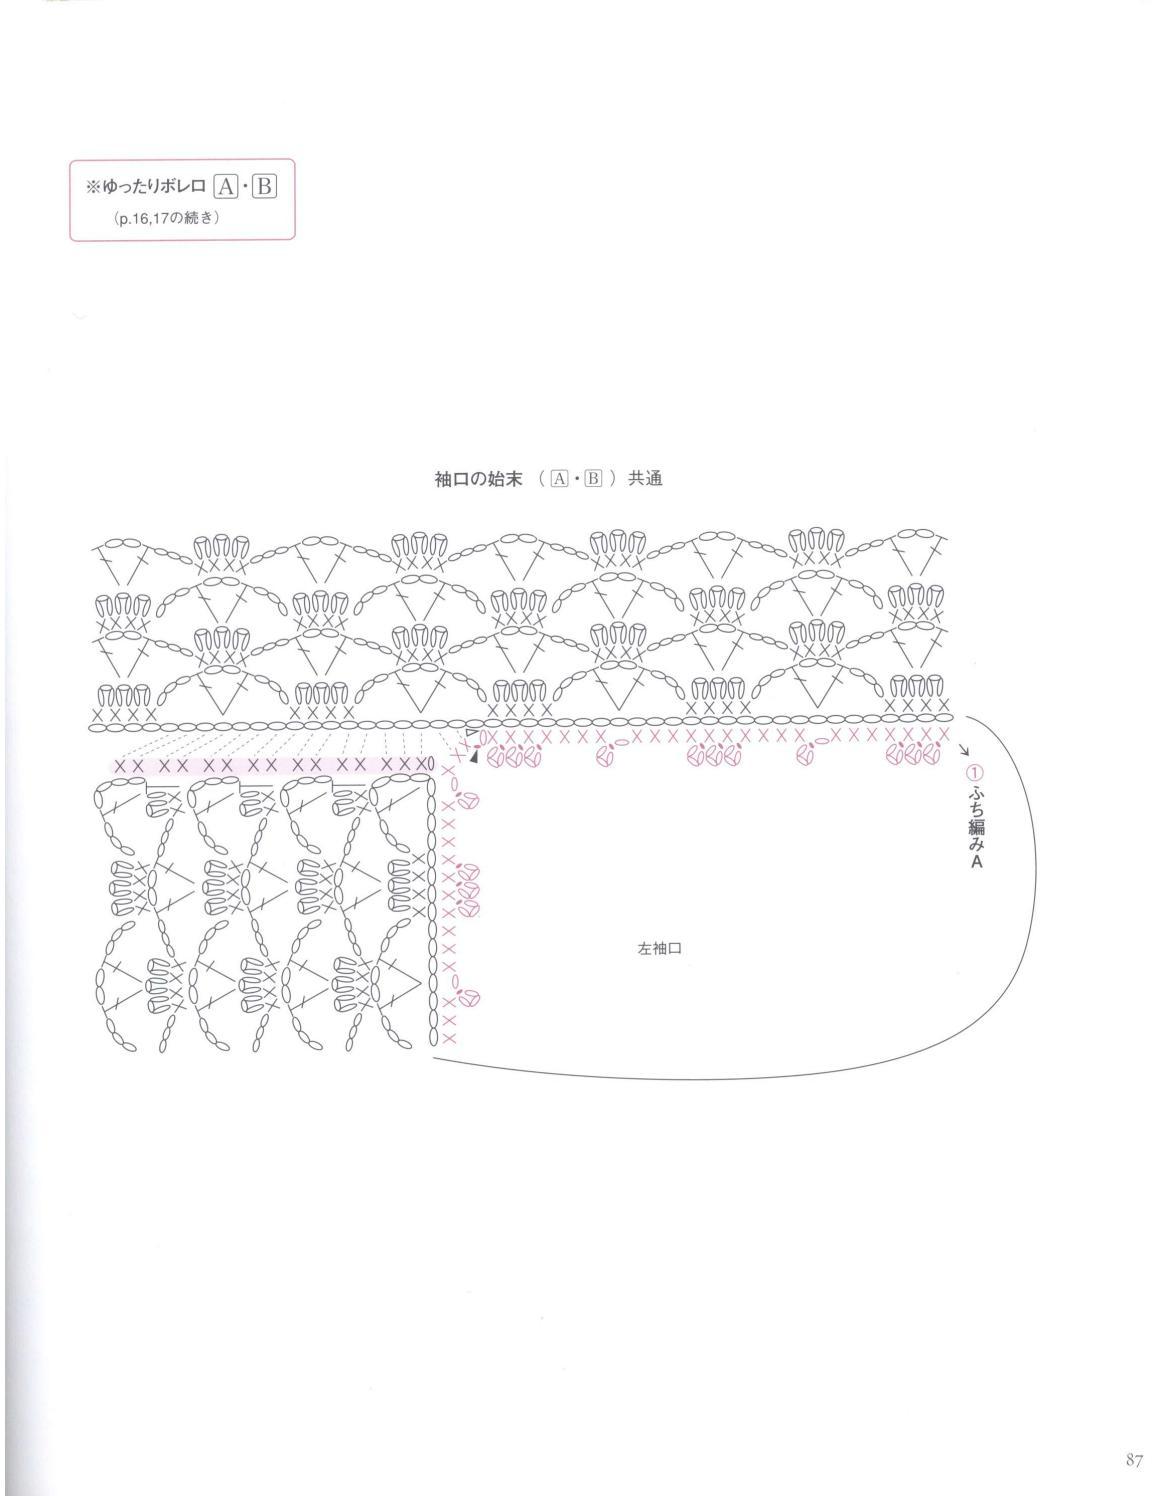 Asahi original crochet best selection 2012 page 87